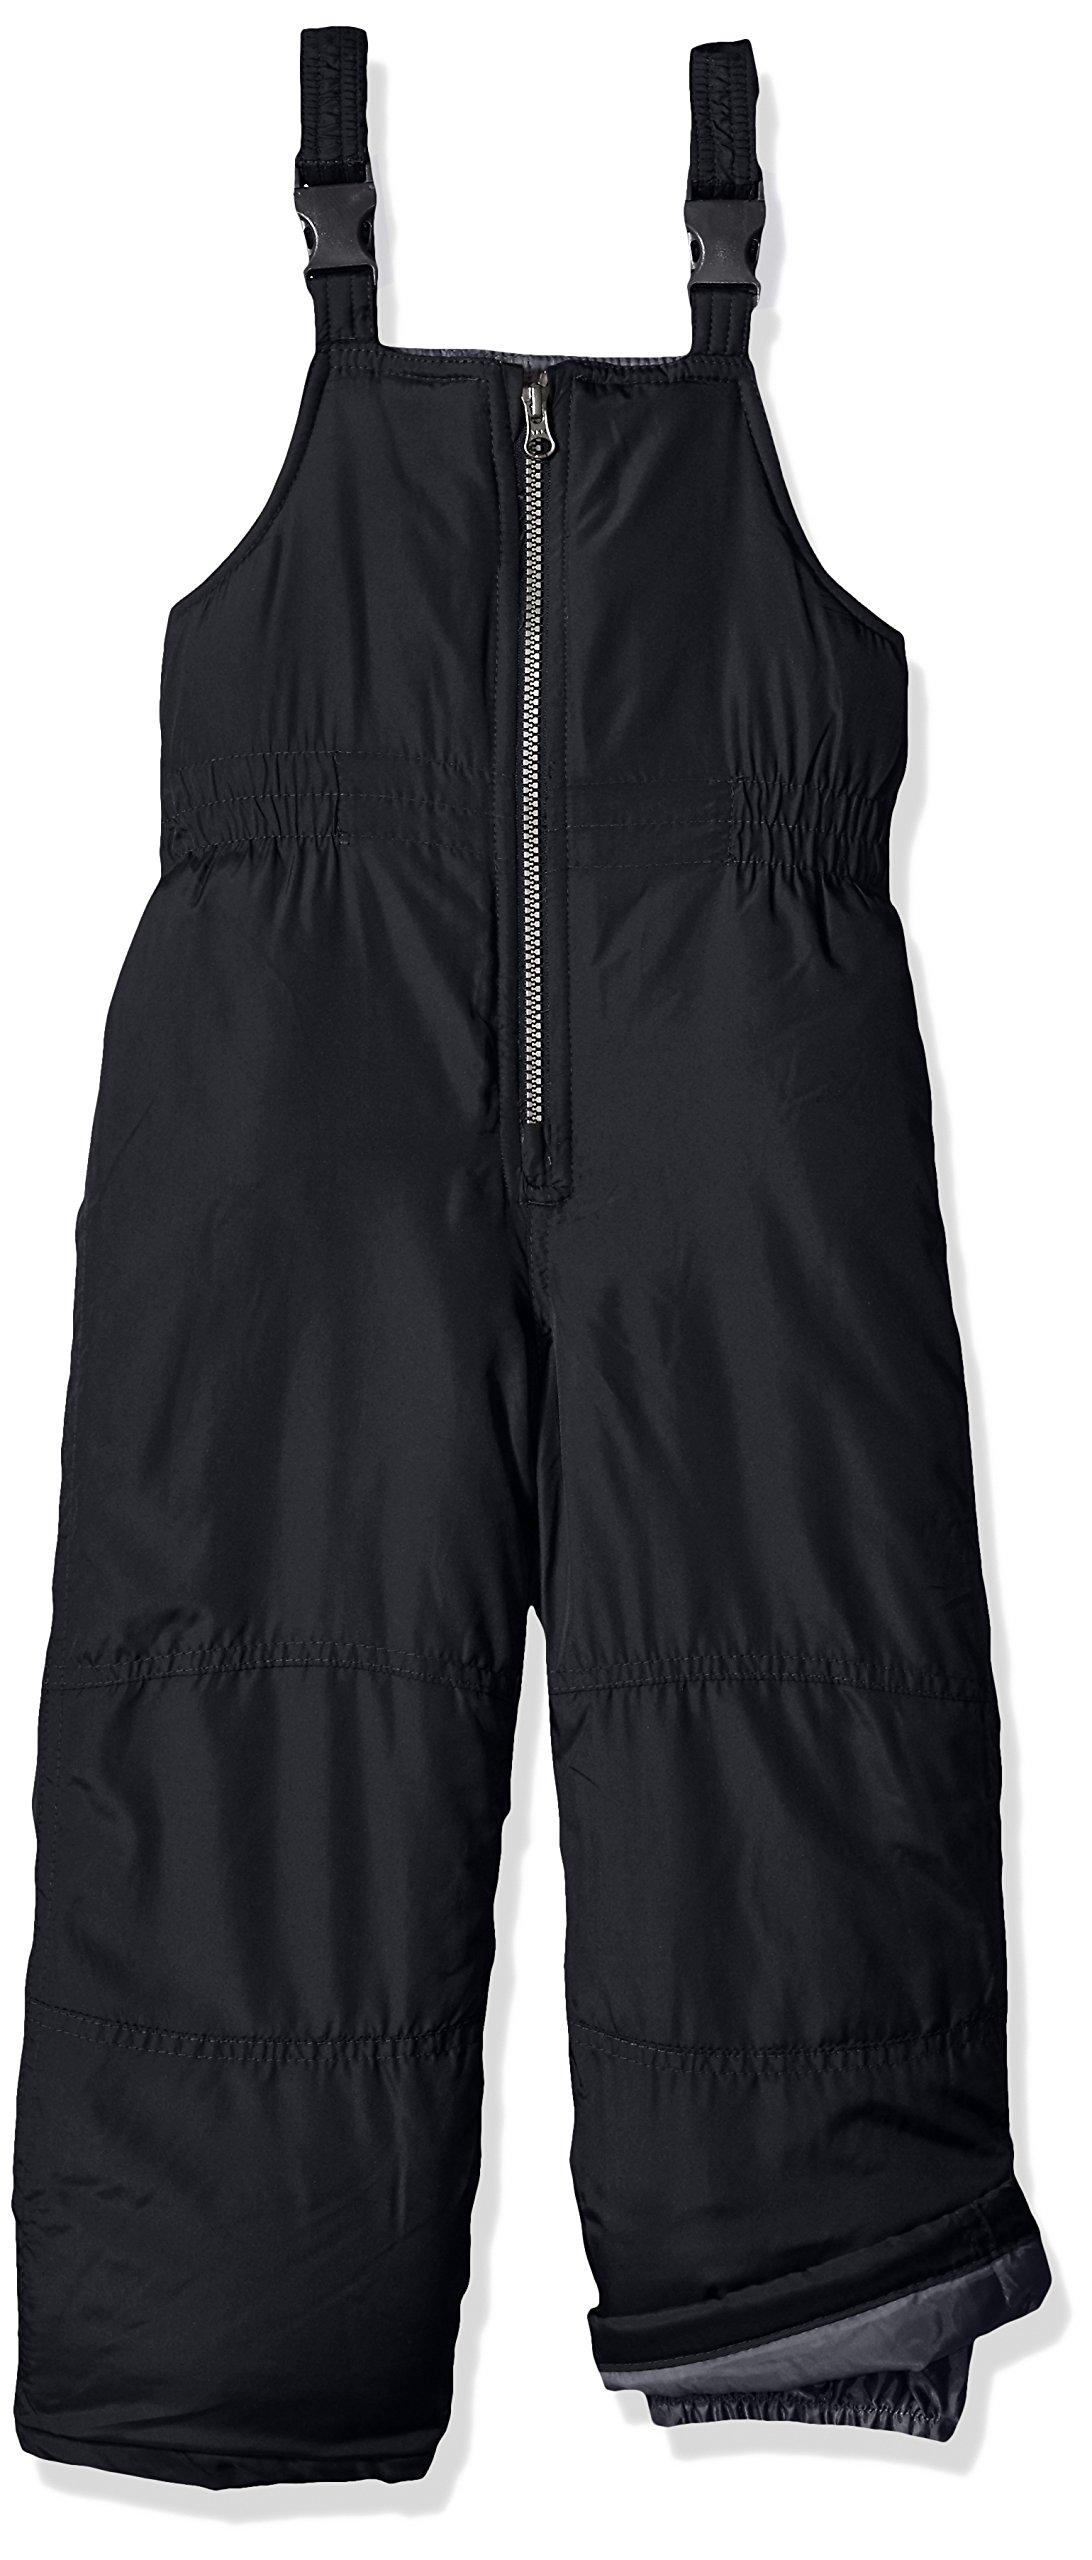 Carter's Little Boys' Snow Bib Ski Pants Snowsuit, Very Black, 7